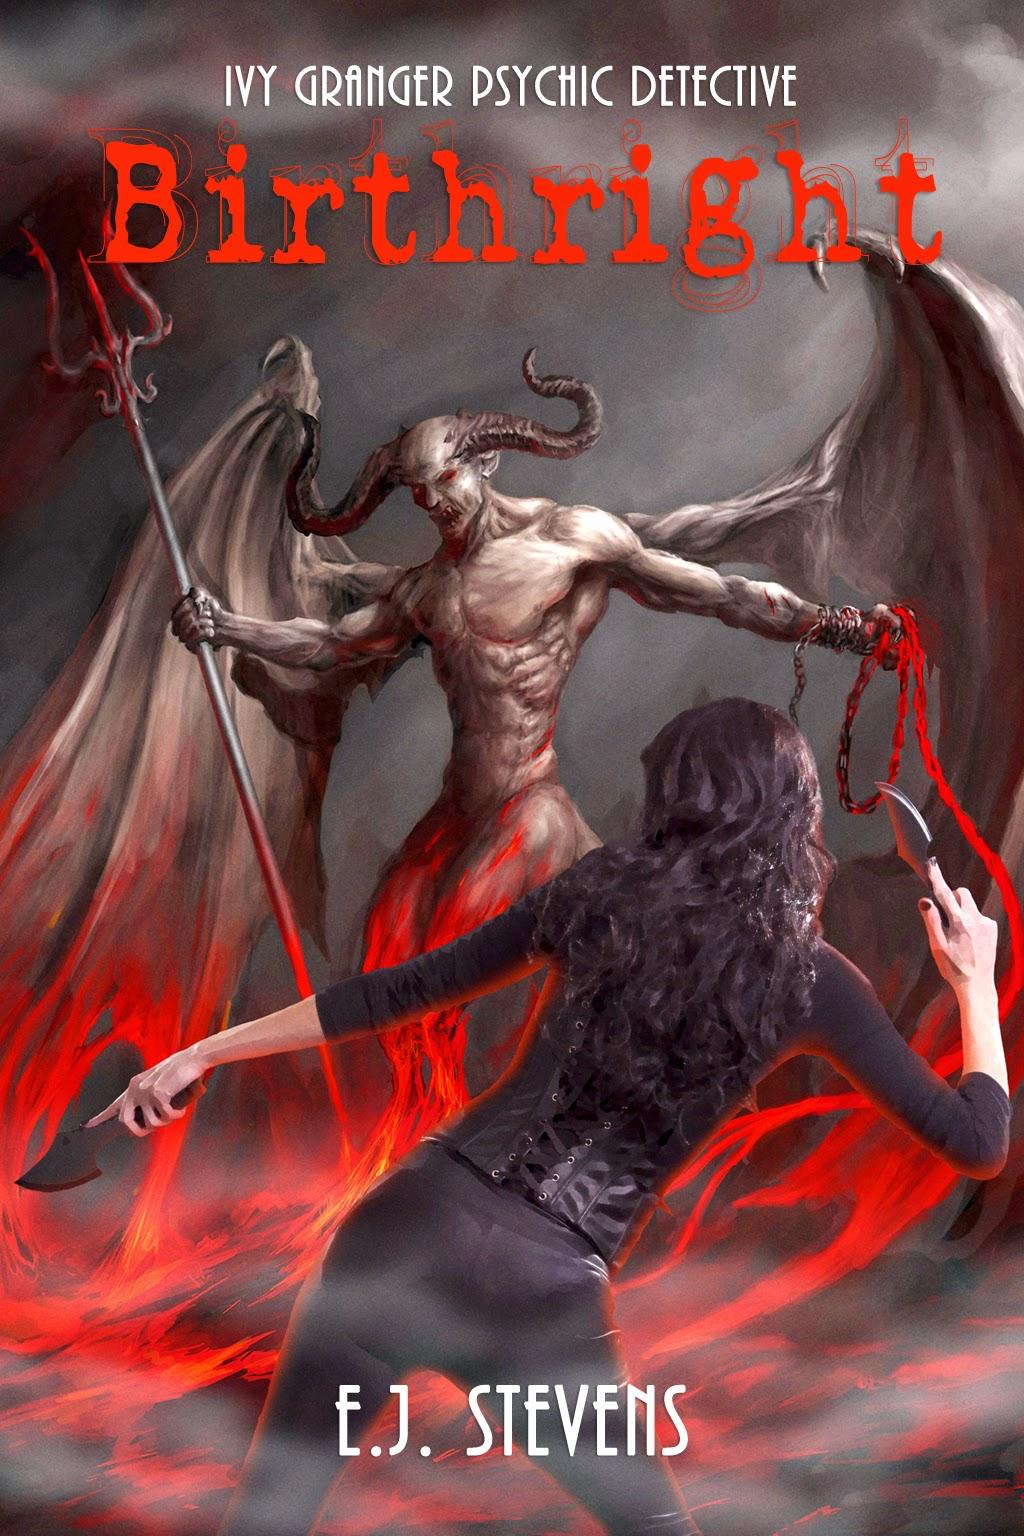 Birthright Ivy Granger urban fantasy by E.J. Stevens